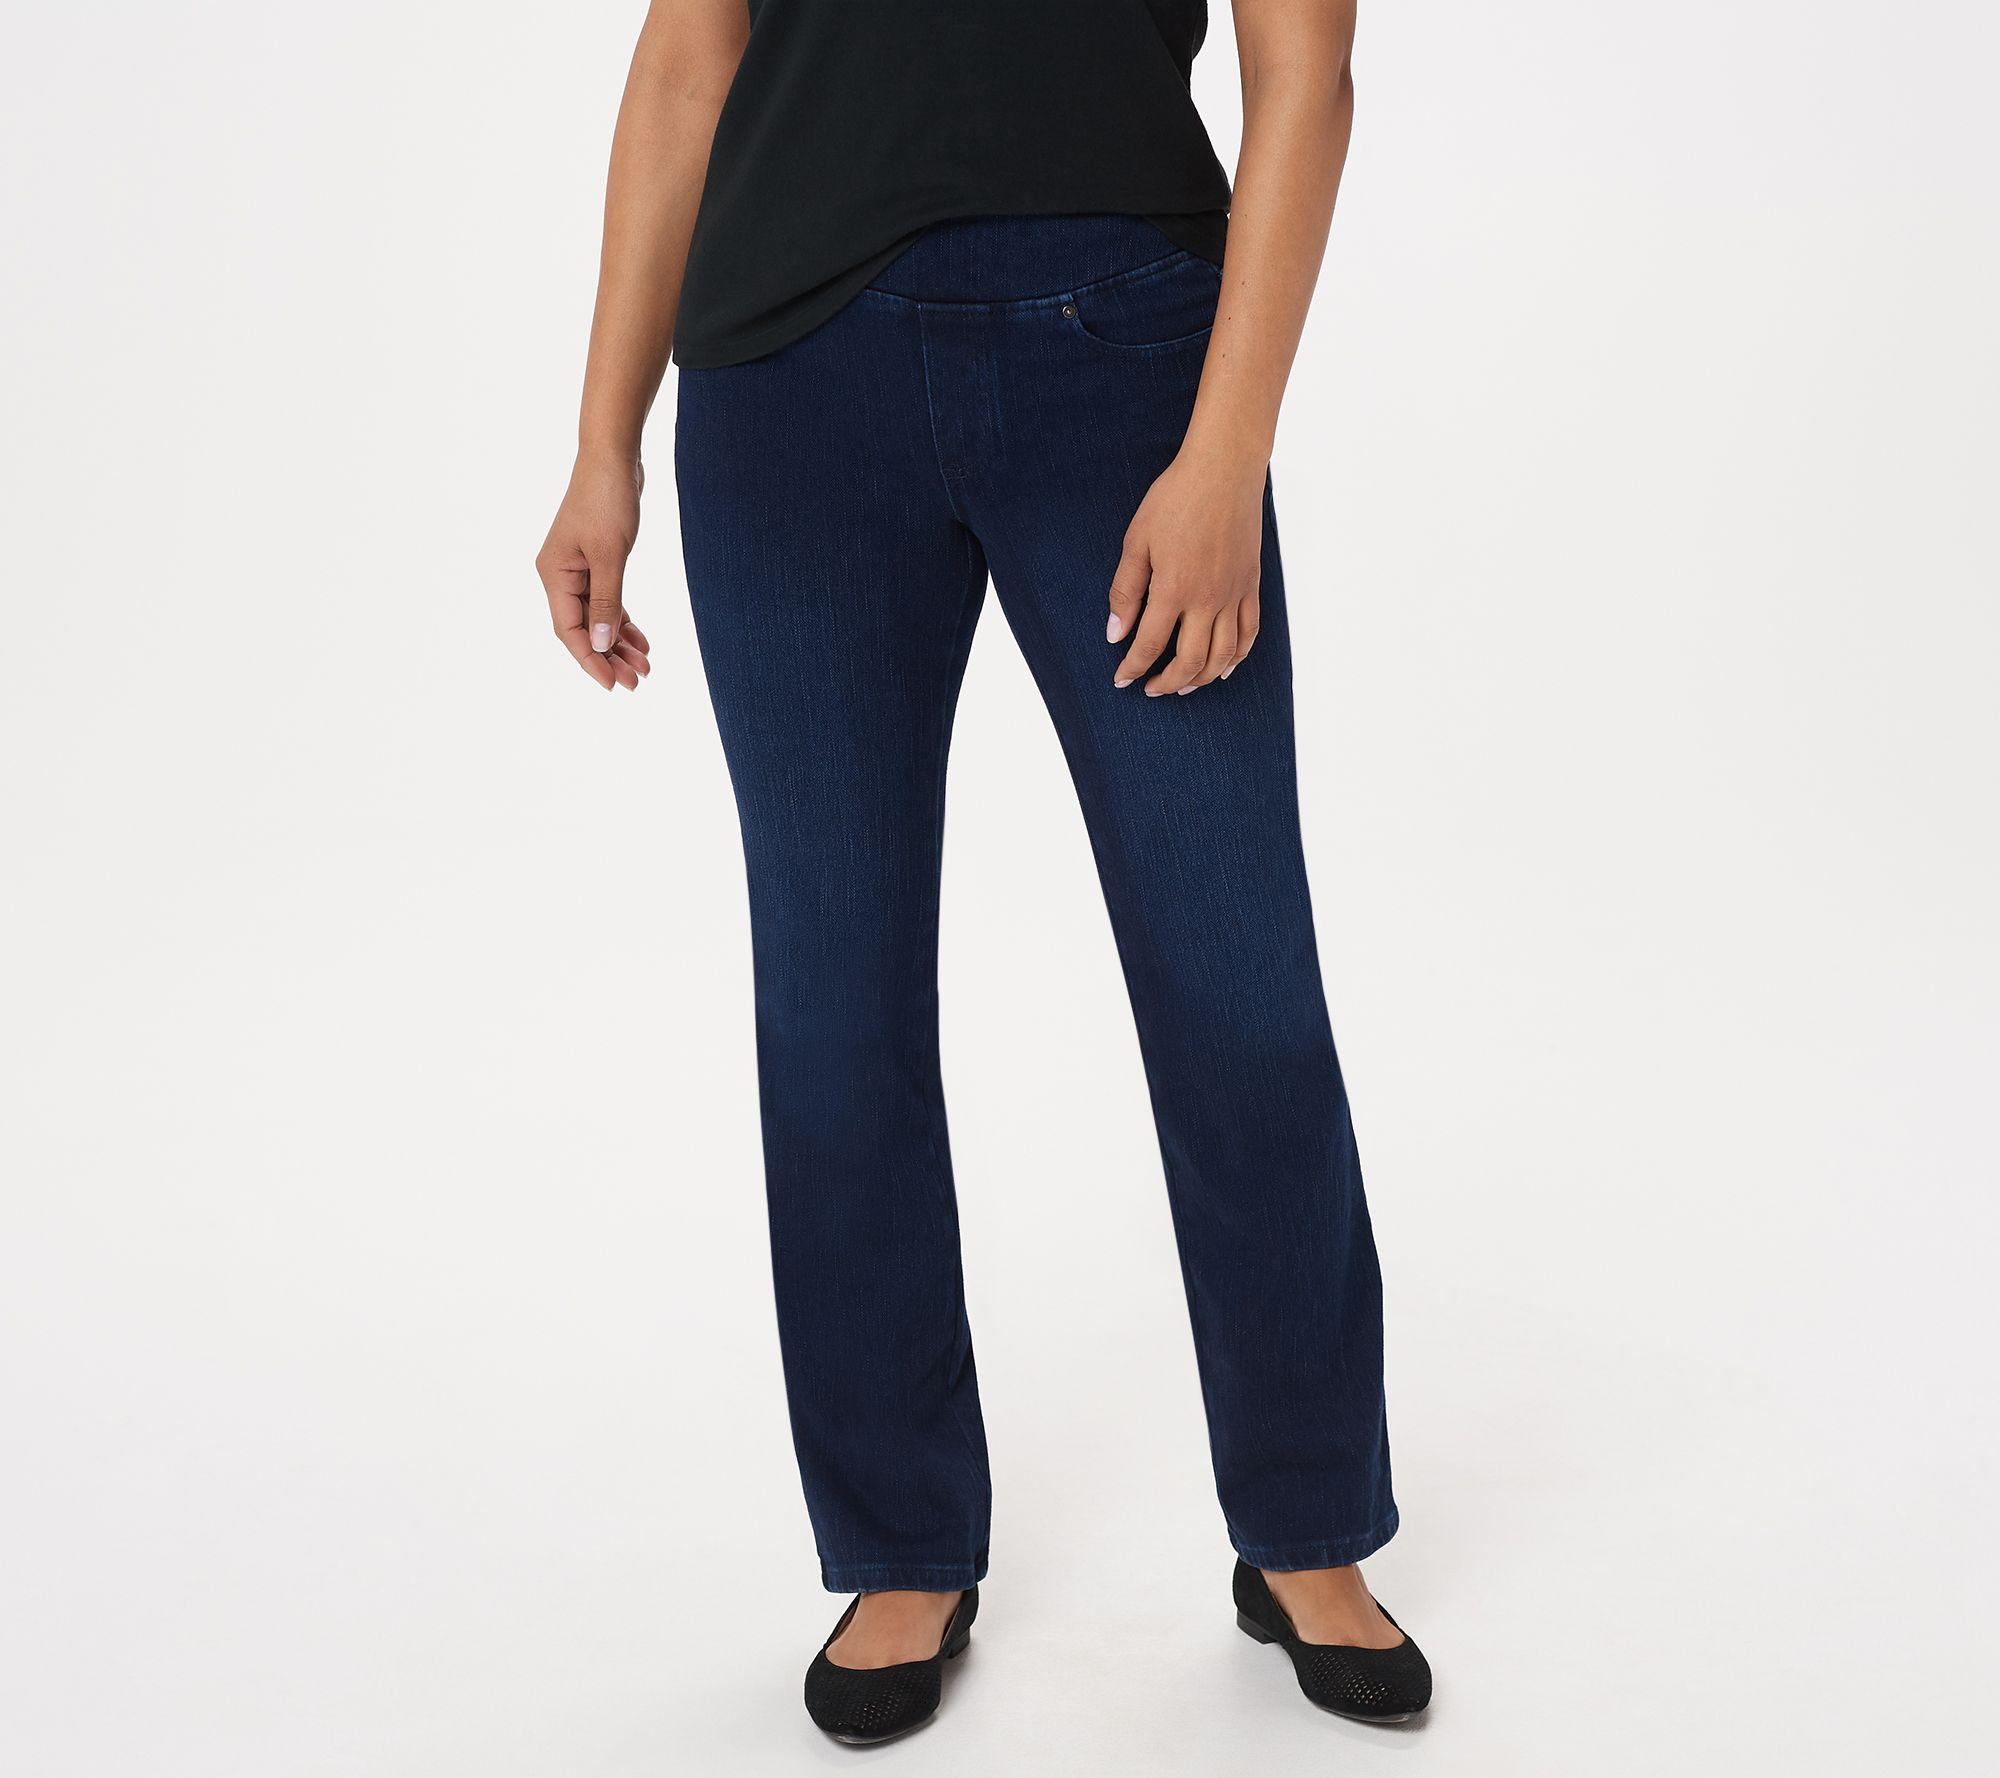 Belle by Kim Gravel Tall Flexibelle Boot-Cut Jeans - A311353